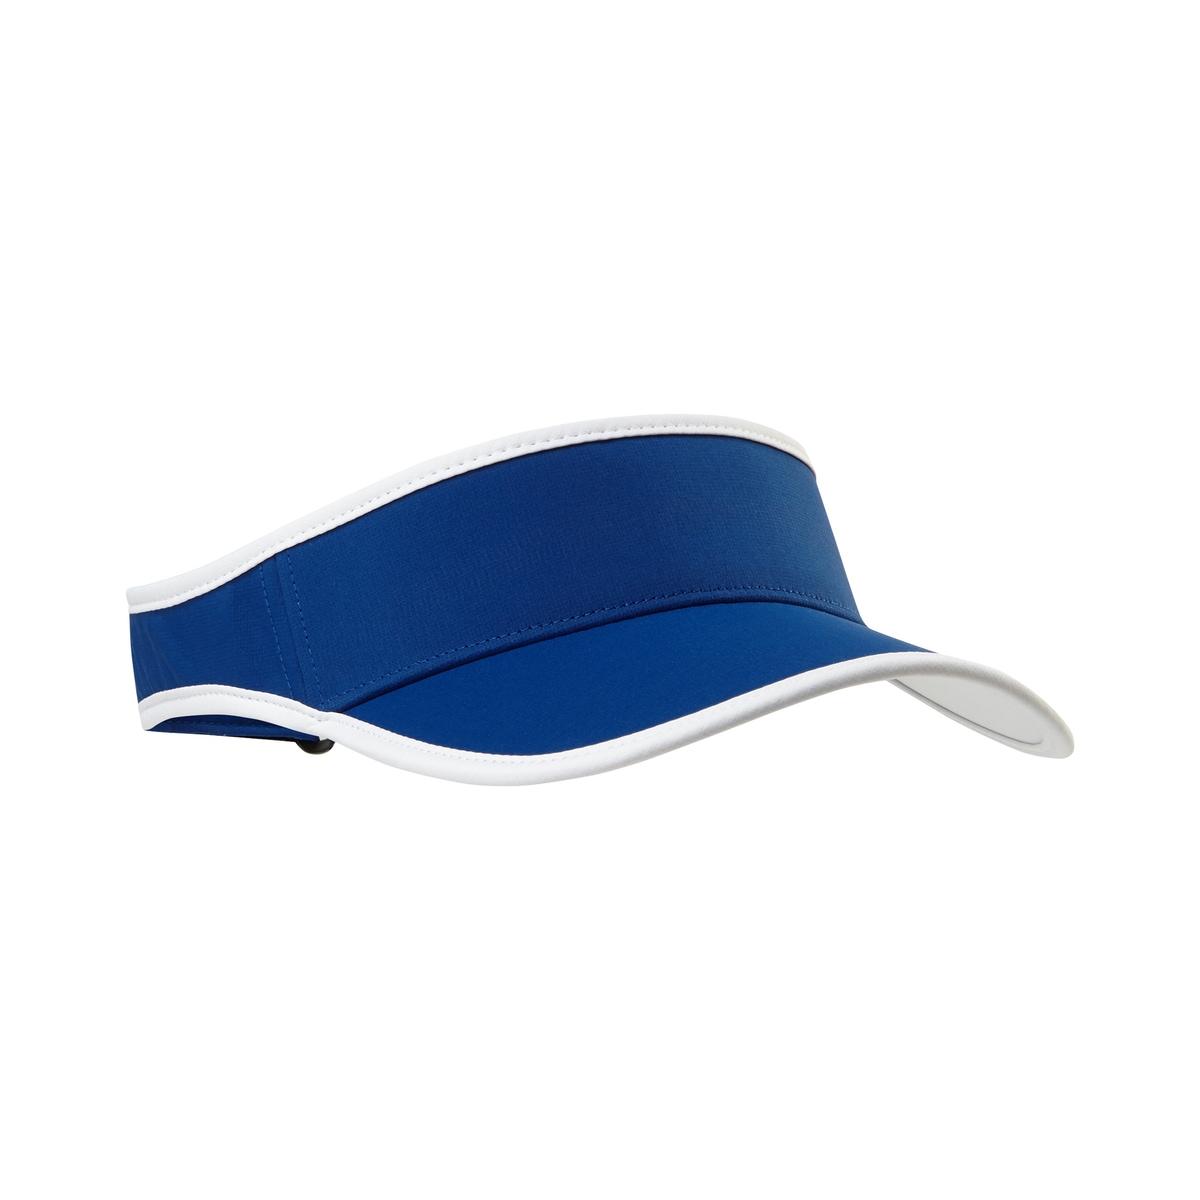 FJ Golfleisure Fashion Adjustable Visor